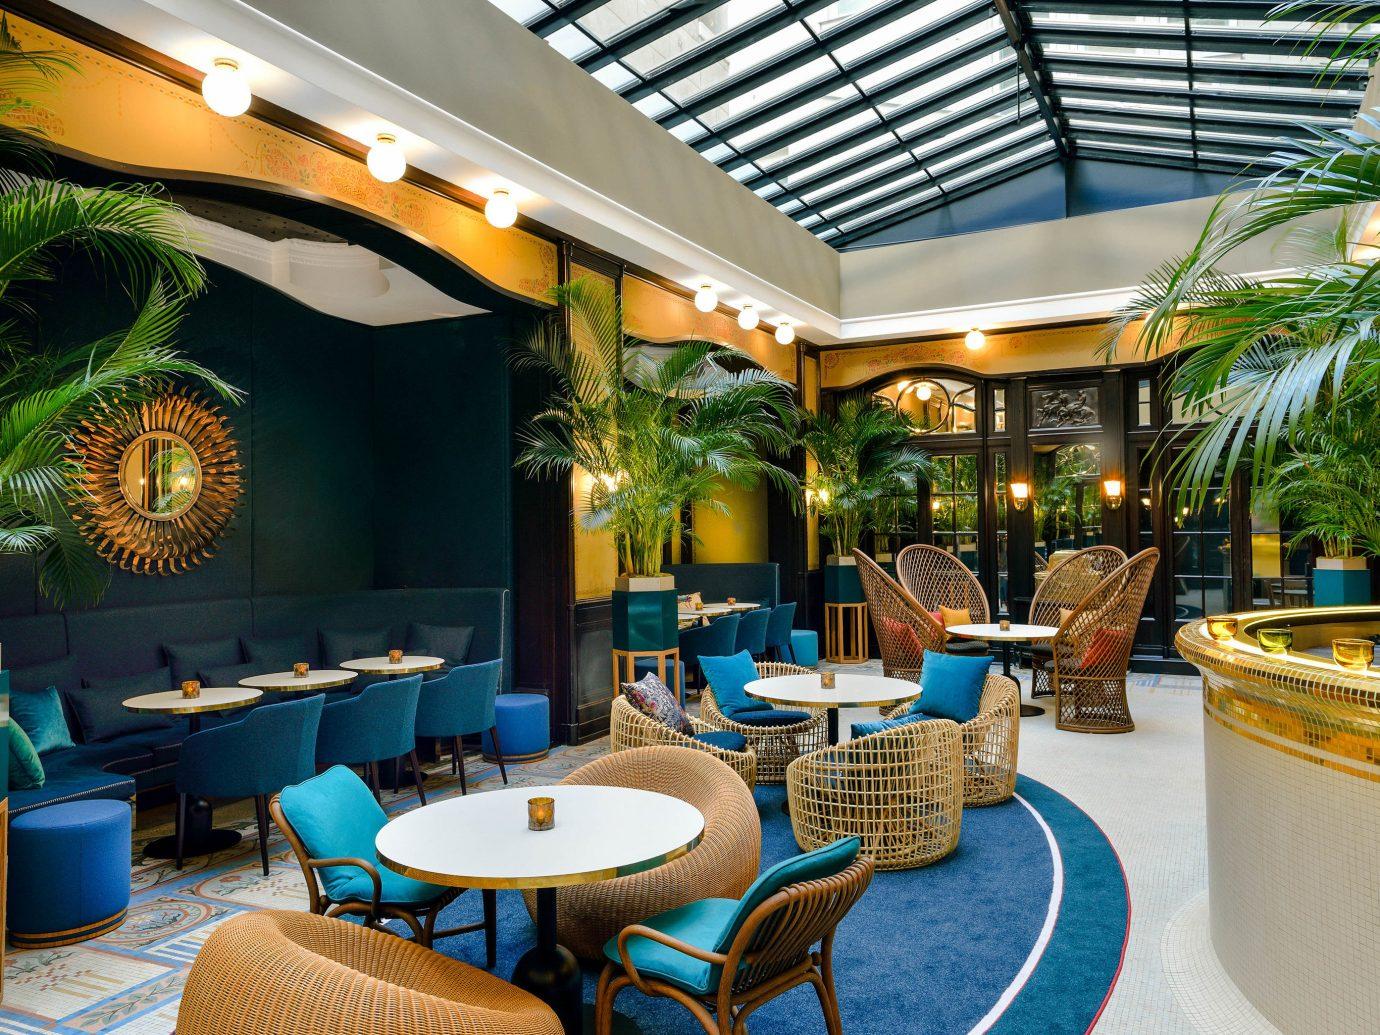 Boutique Hotels Hotels chair indoor interior design restaurant Resort real estate Lobby leisure furniture